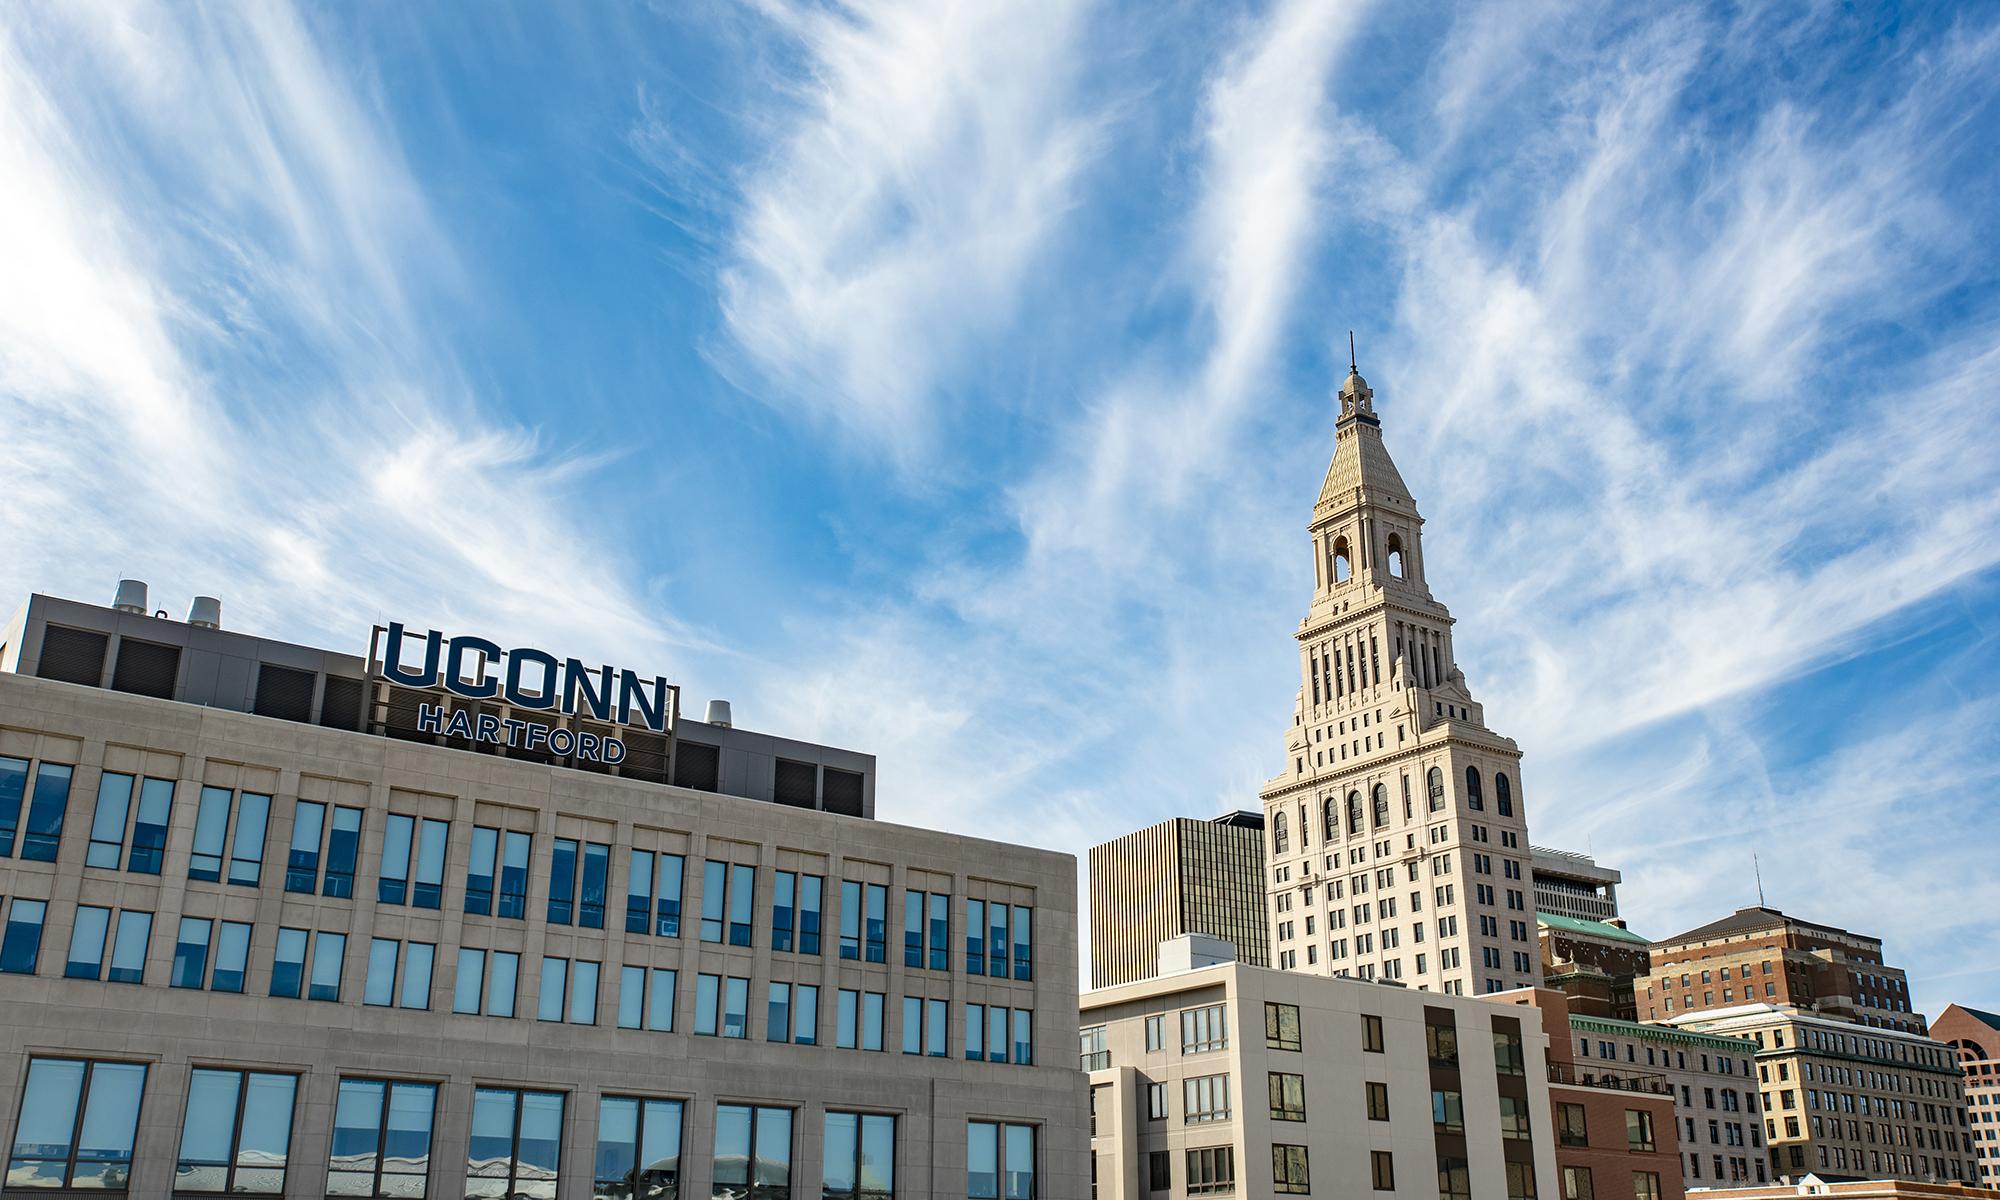 UConn Hartford downtown